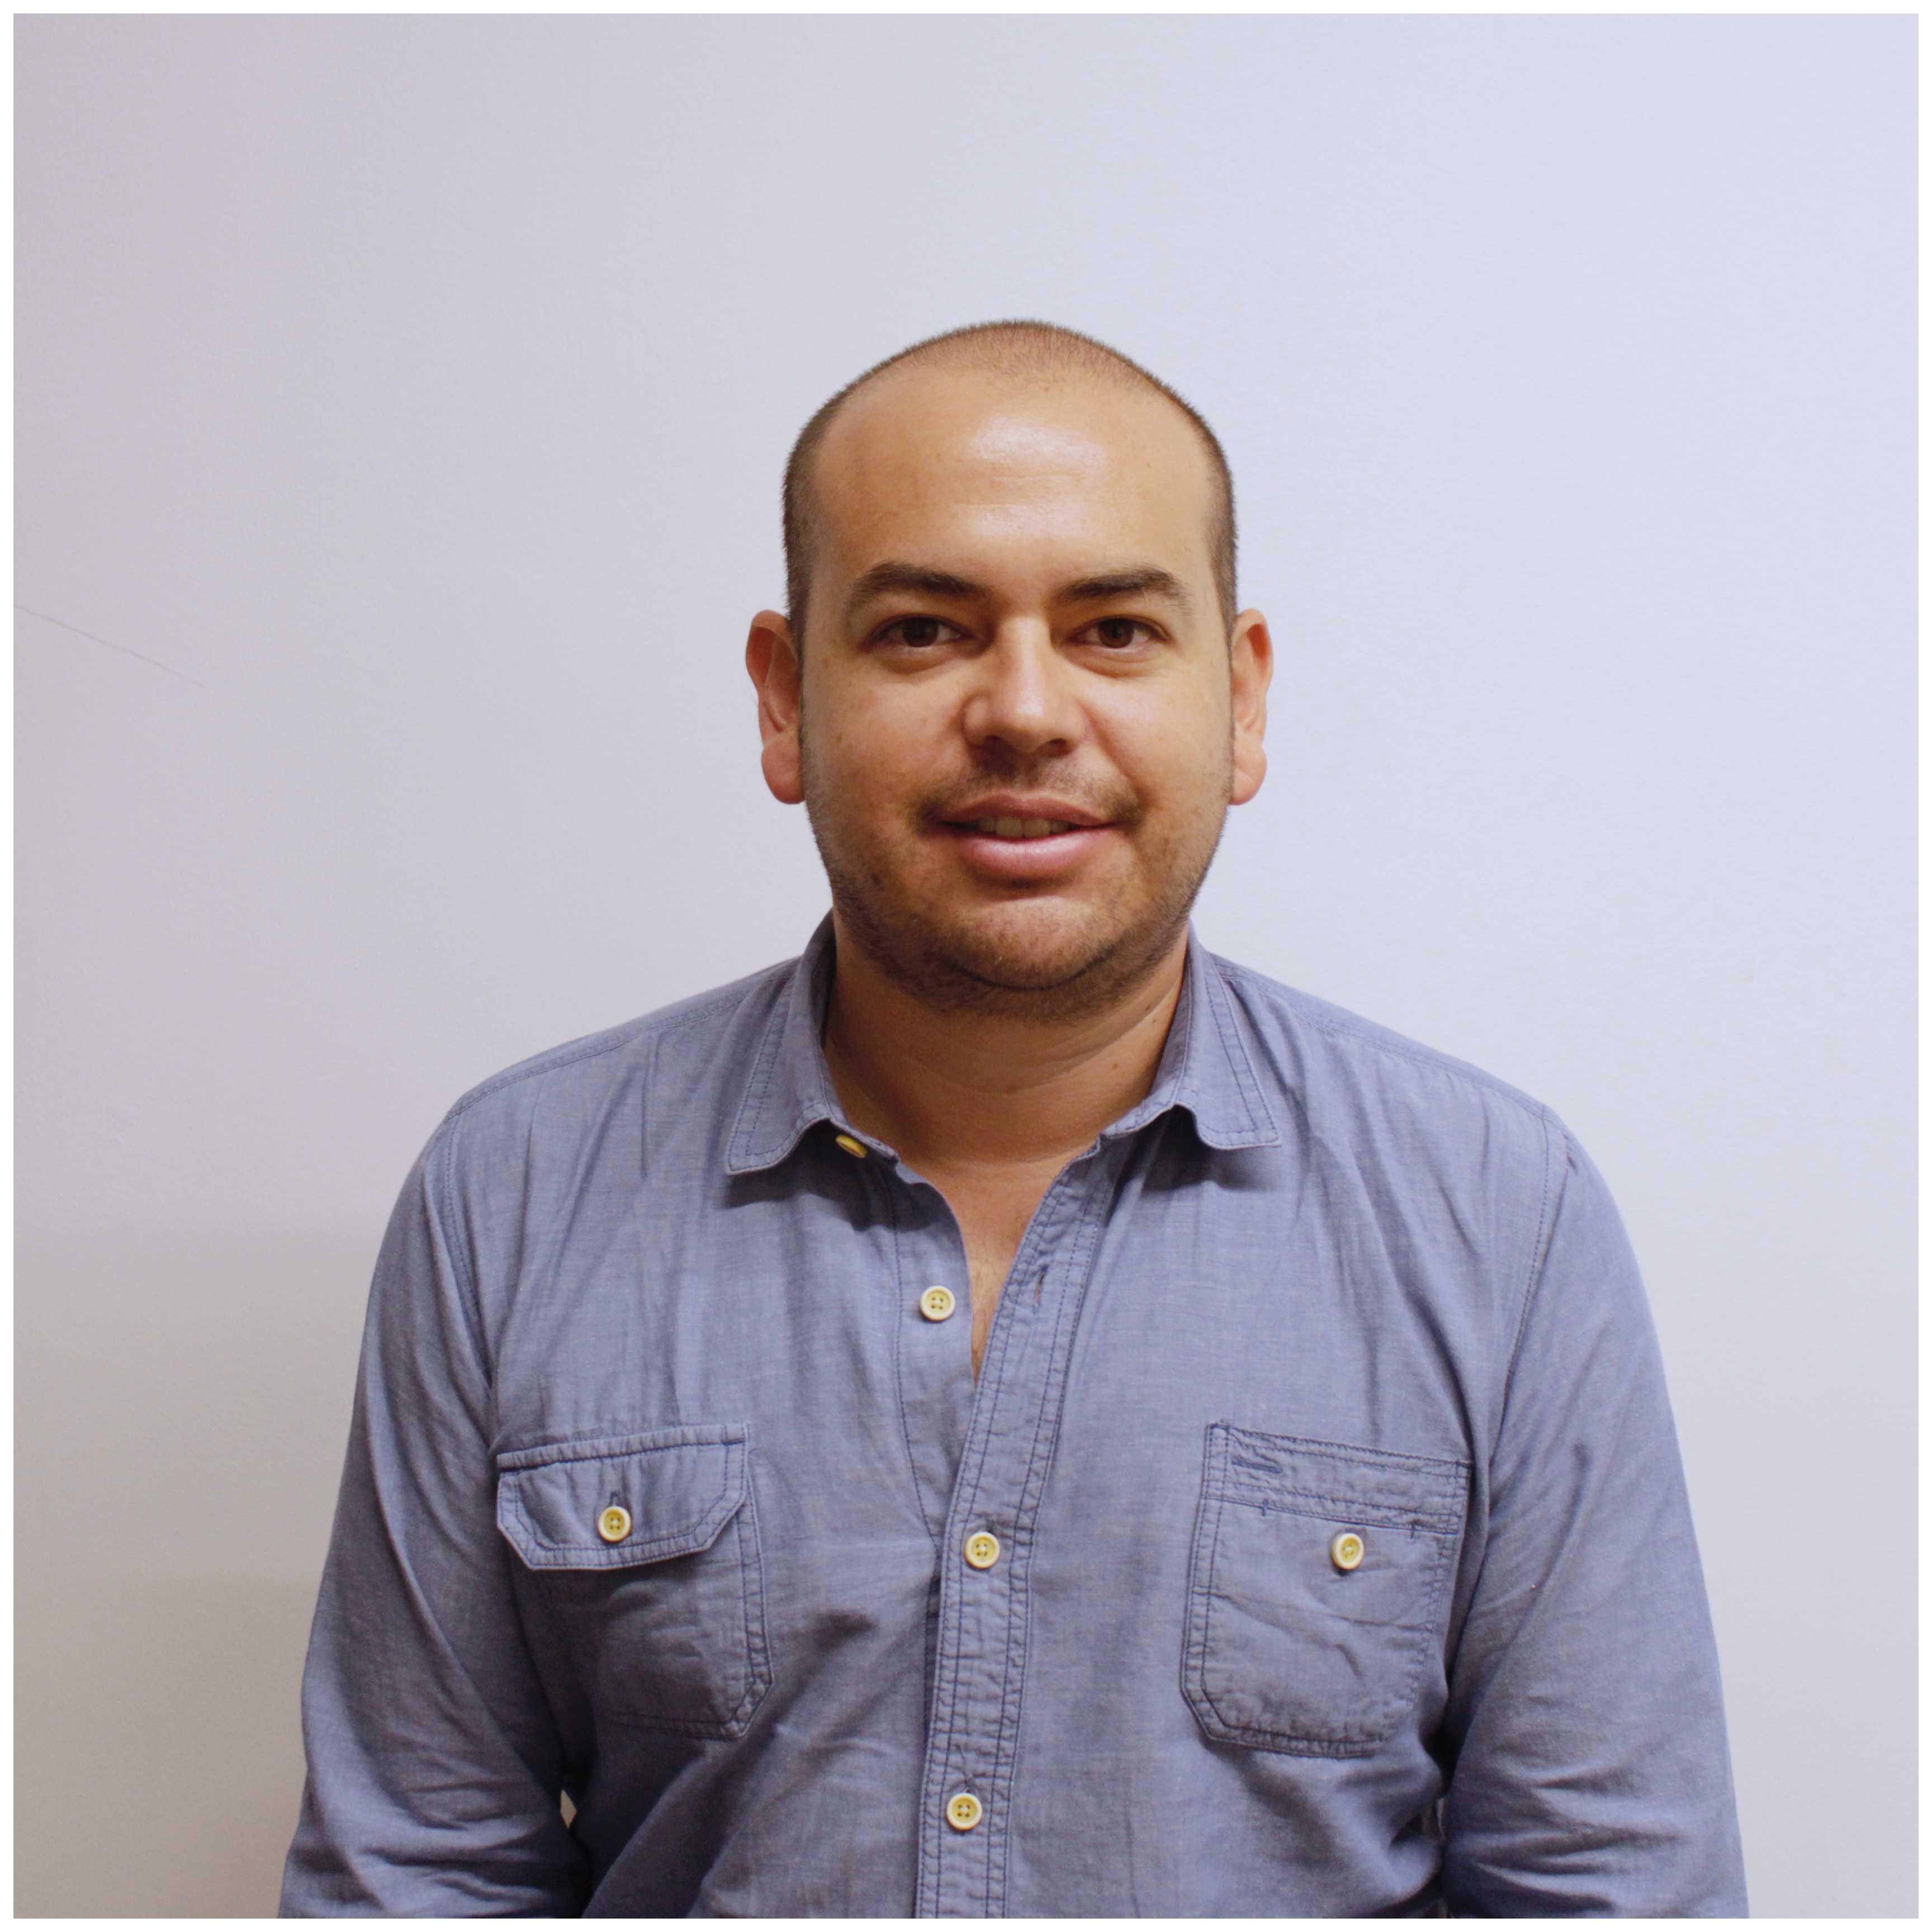 Jorge Sierra Molina